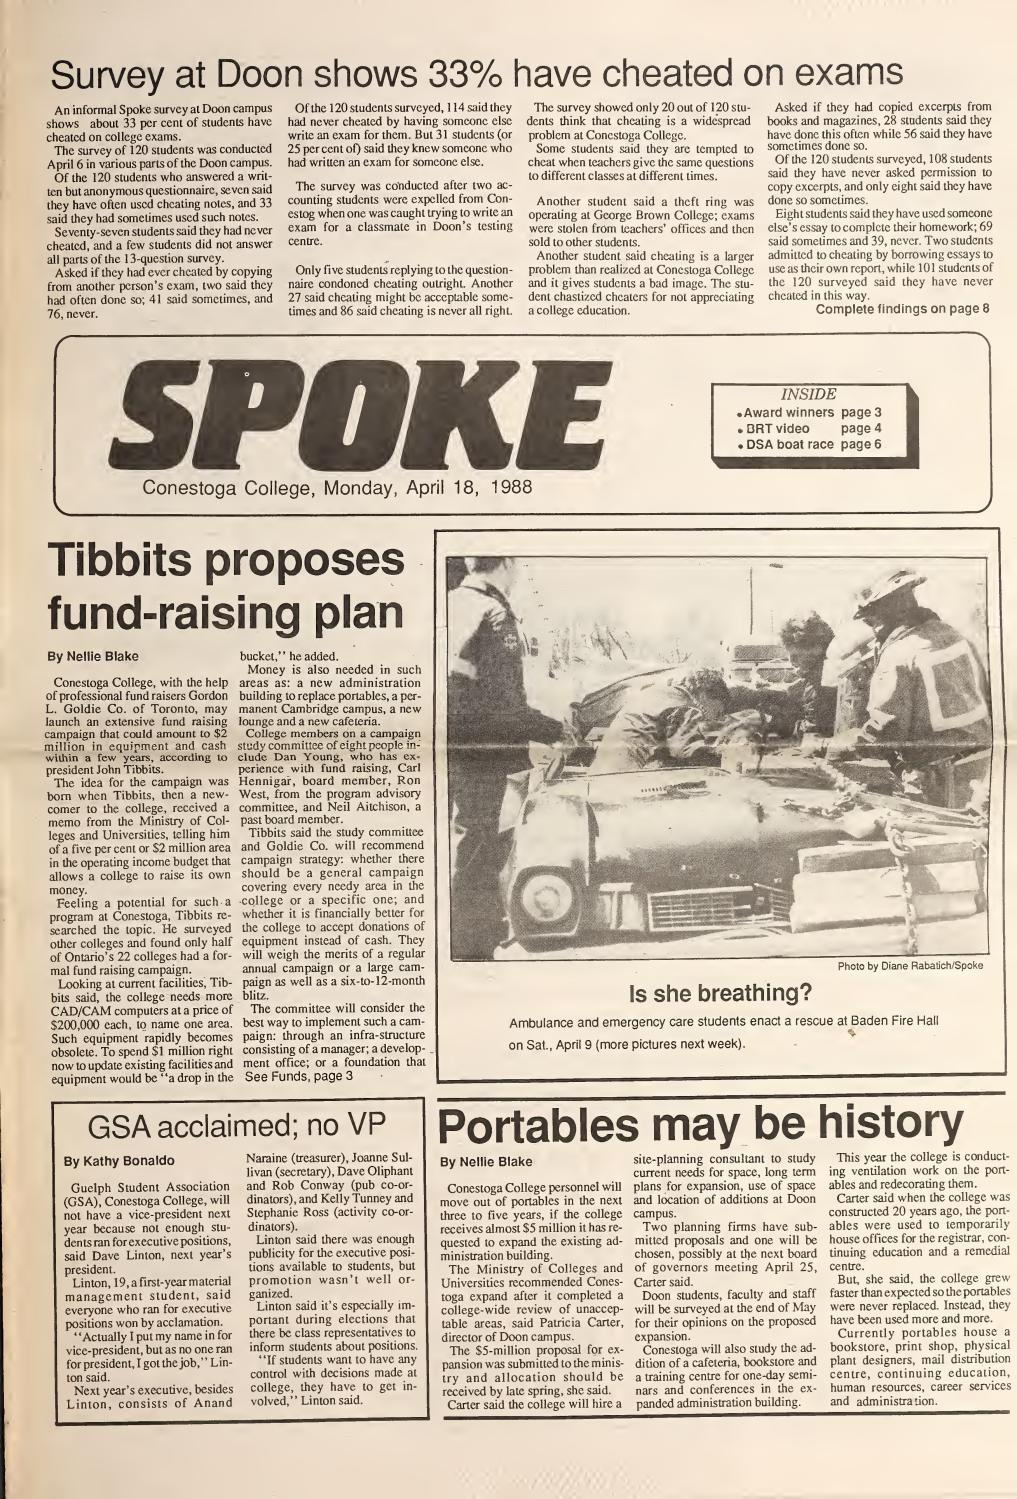 Digital Edition - April 18, 1988 by SPOKENewspaper - issuu